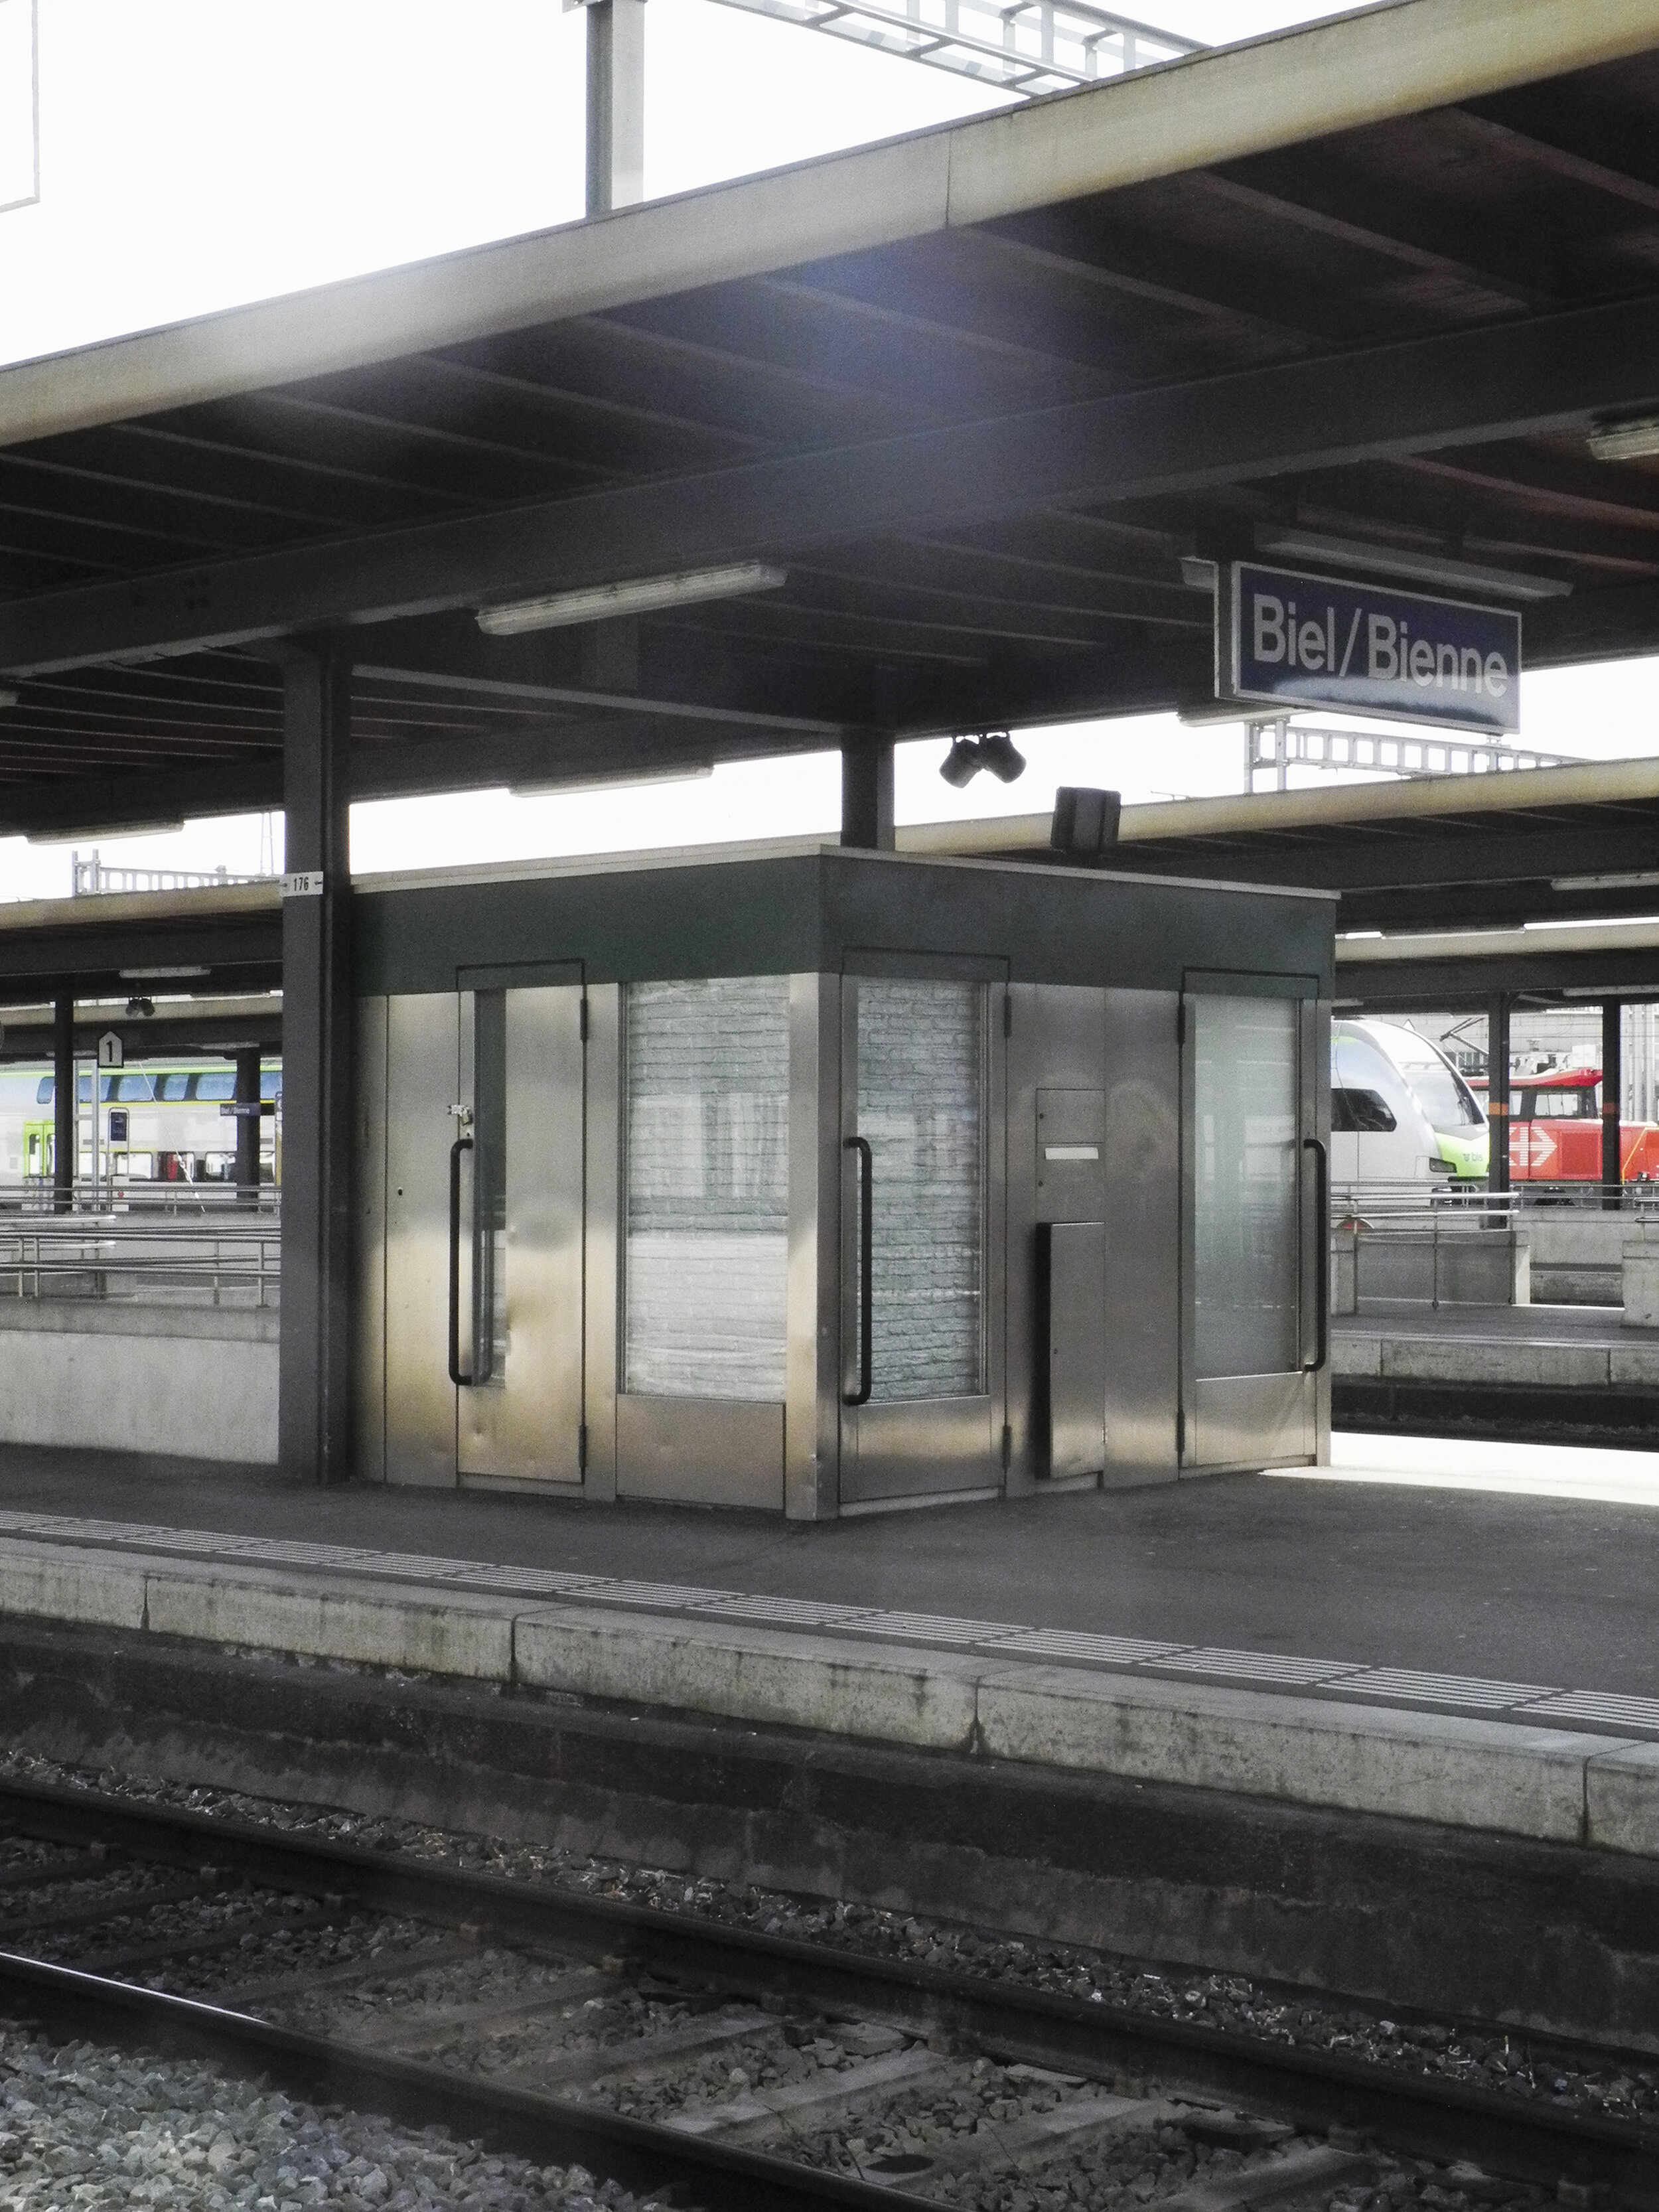 Halley Biel Train Station 10.jpg